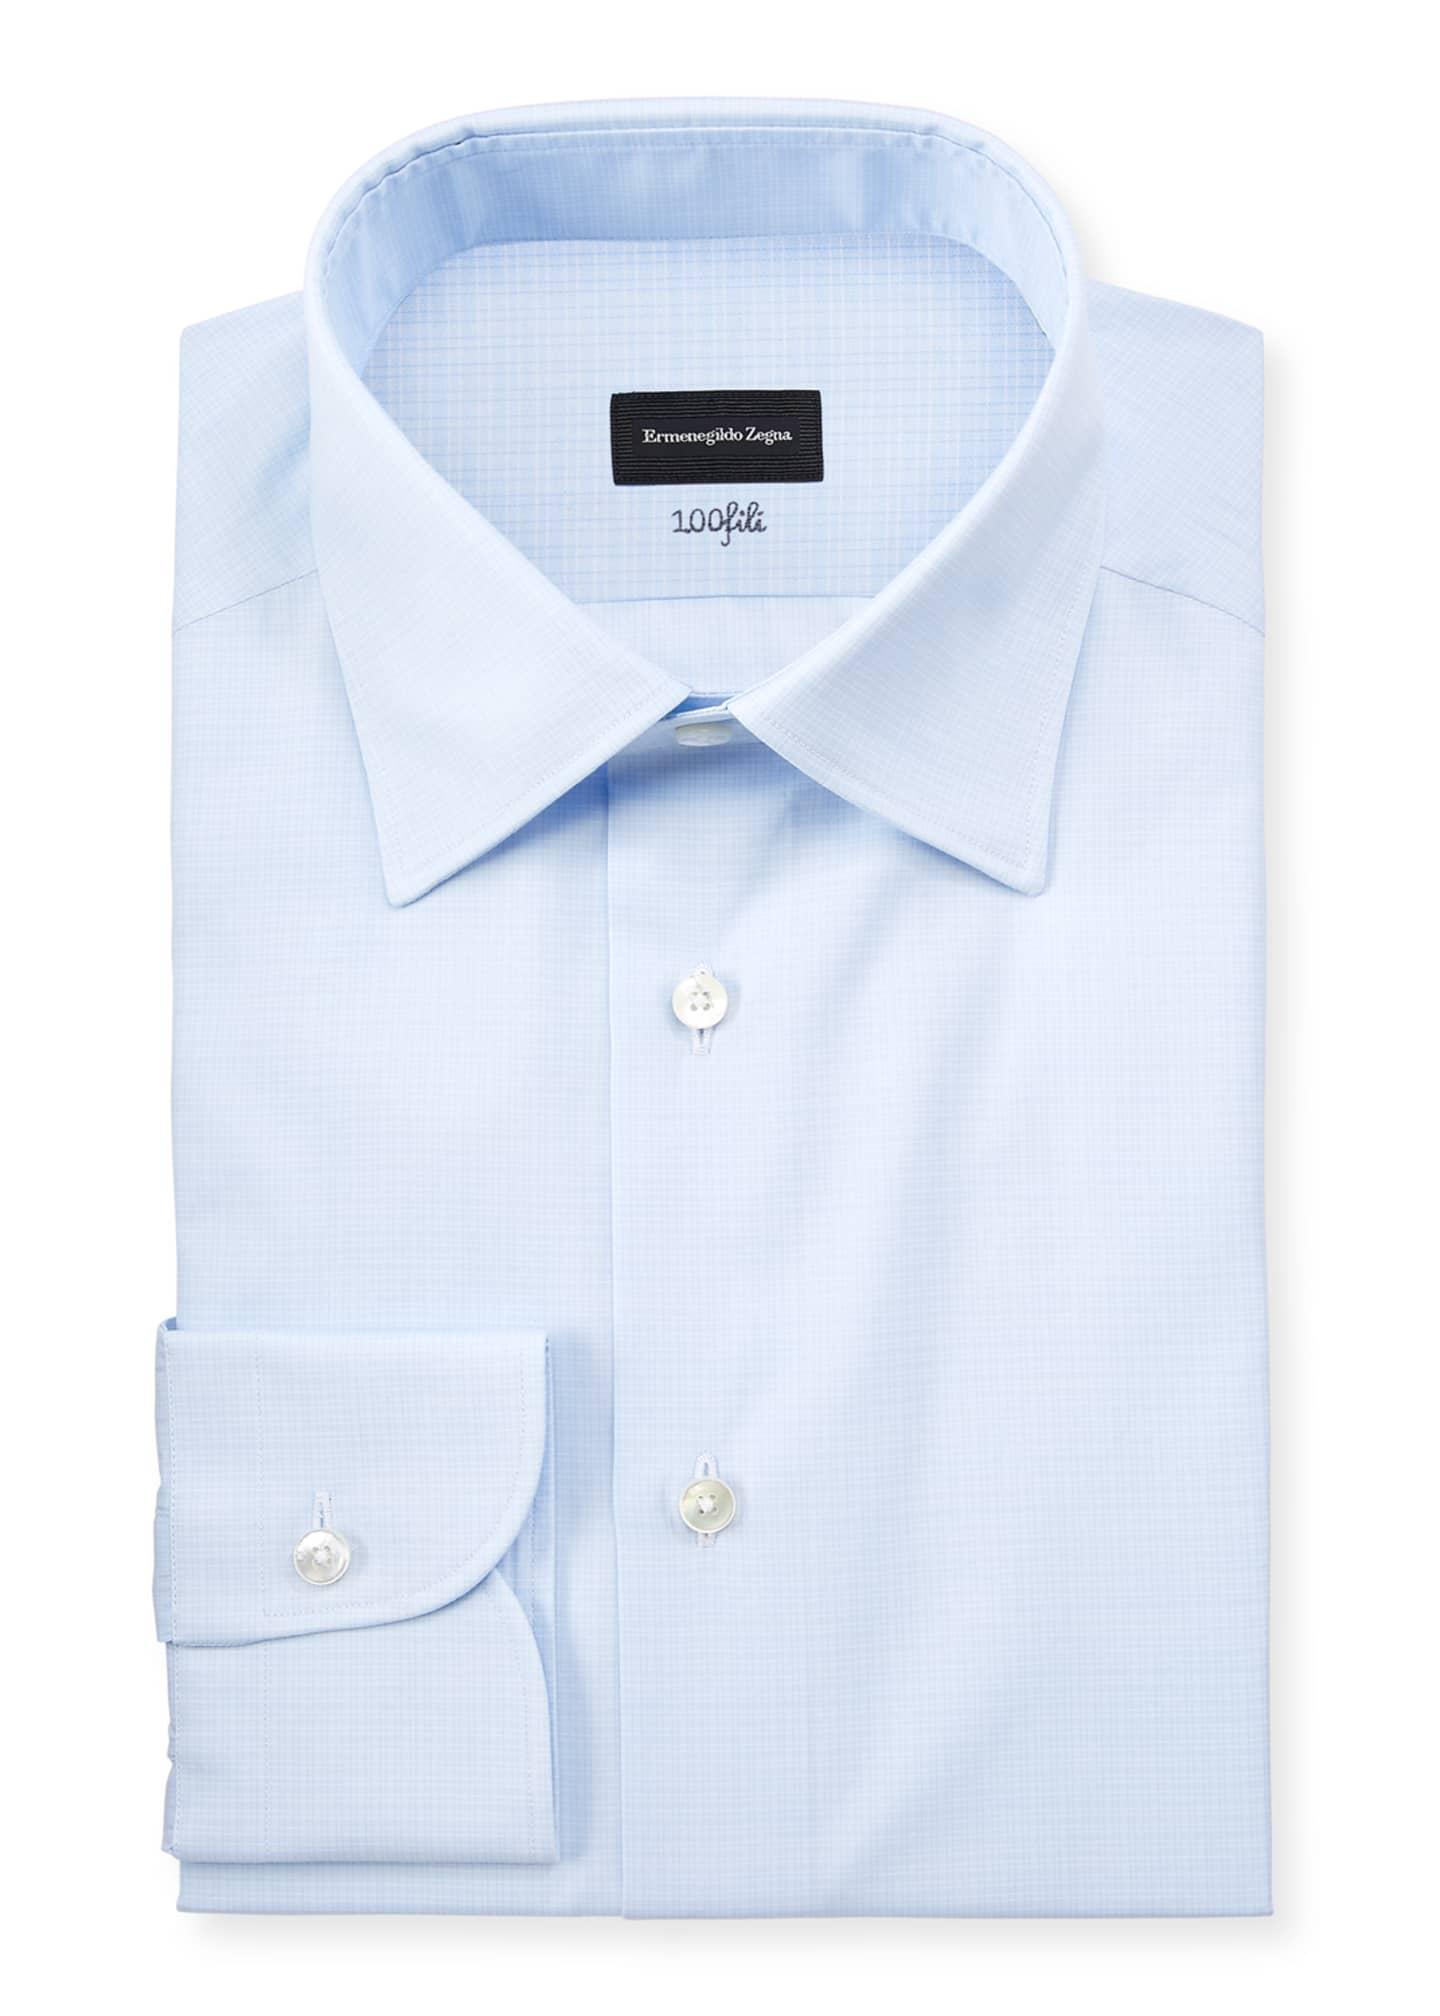 Ermenegildo Zegna Men's Cotton Tonal Check Cento Dress